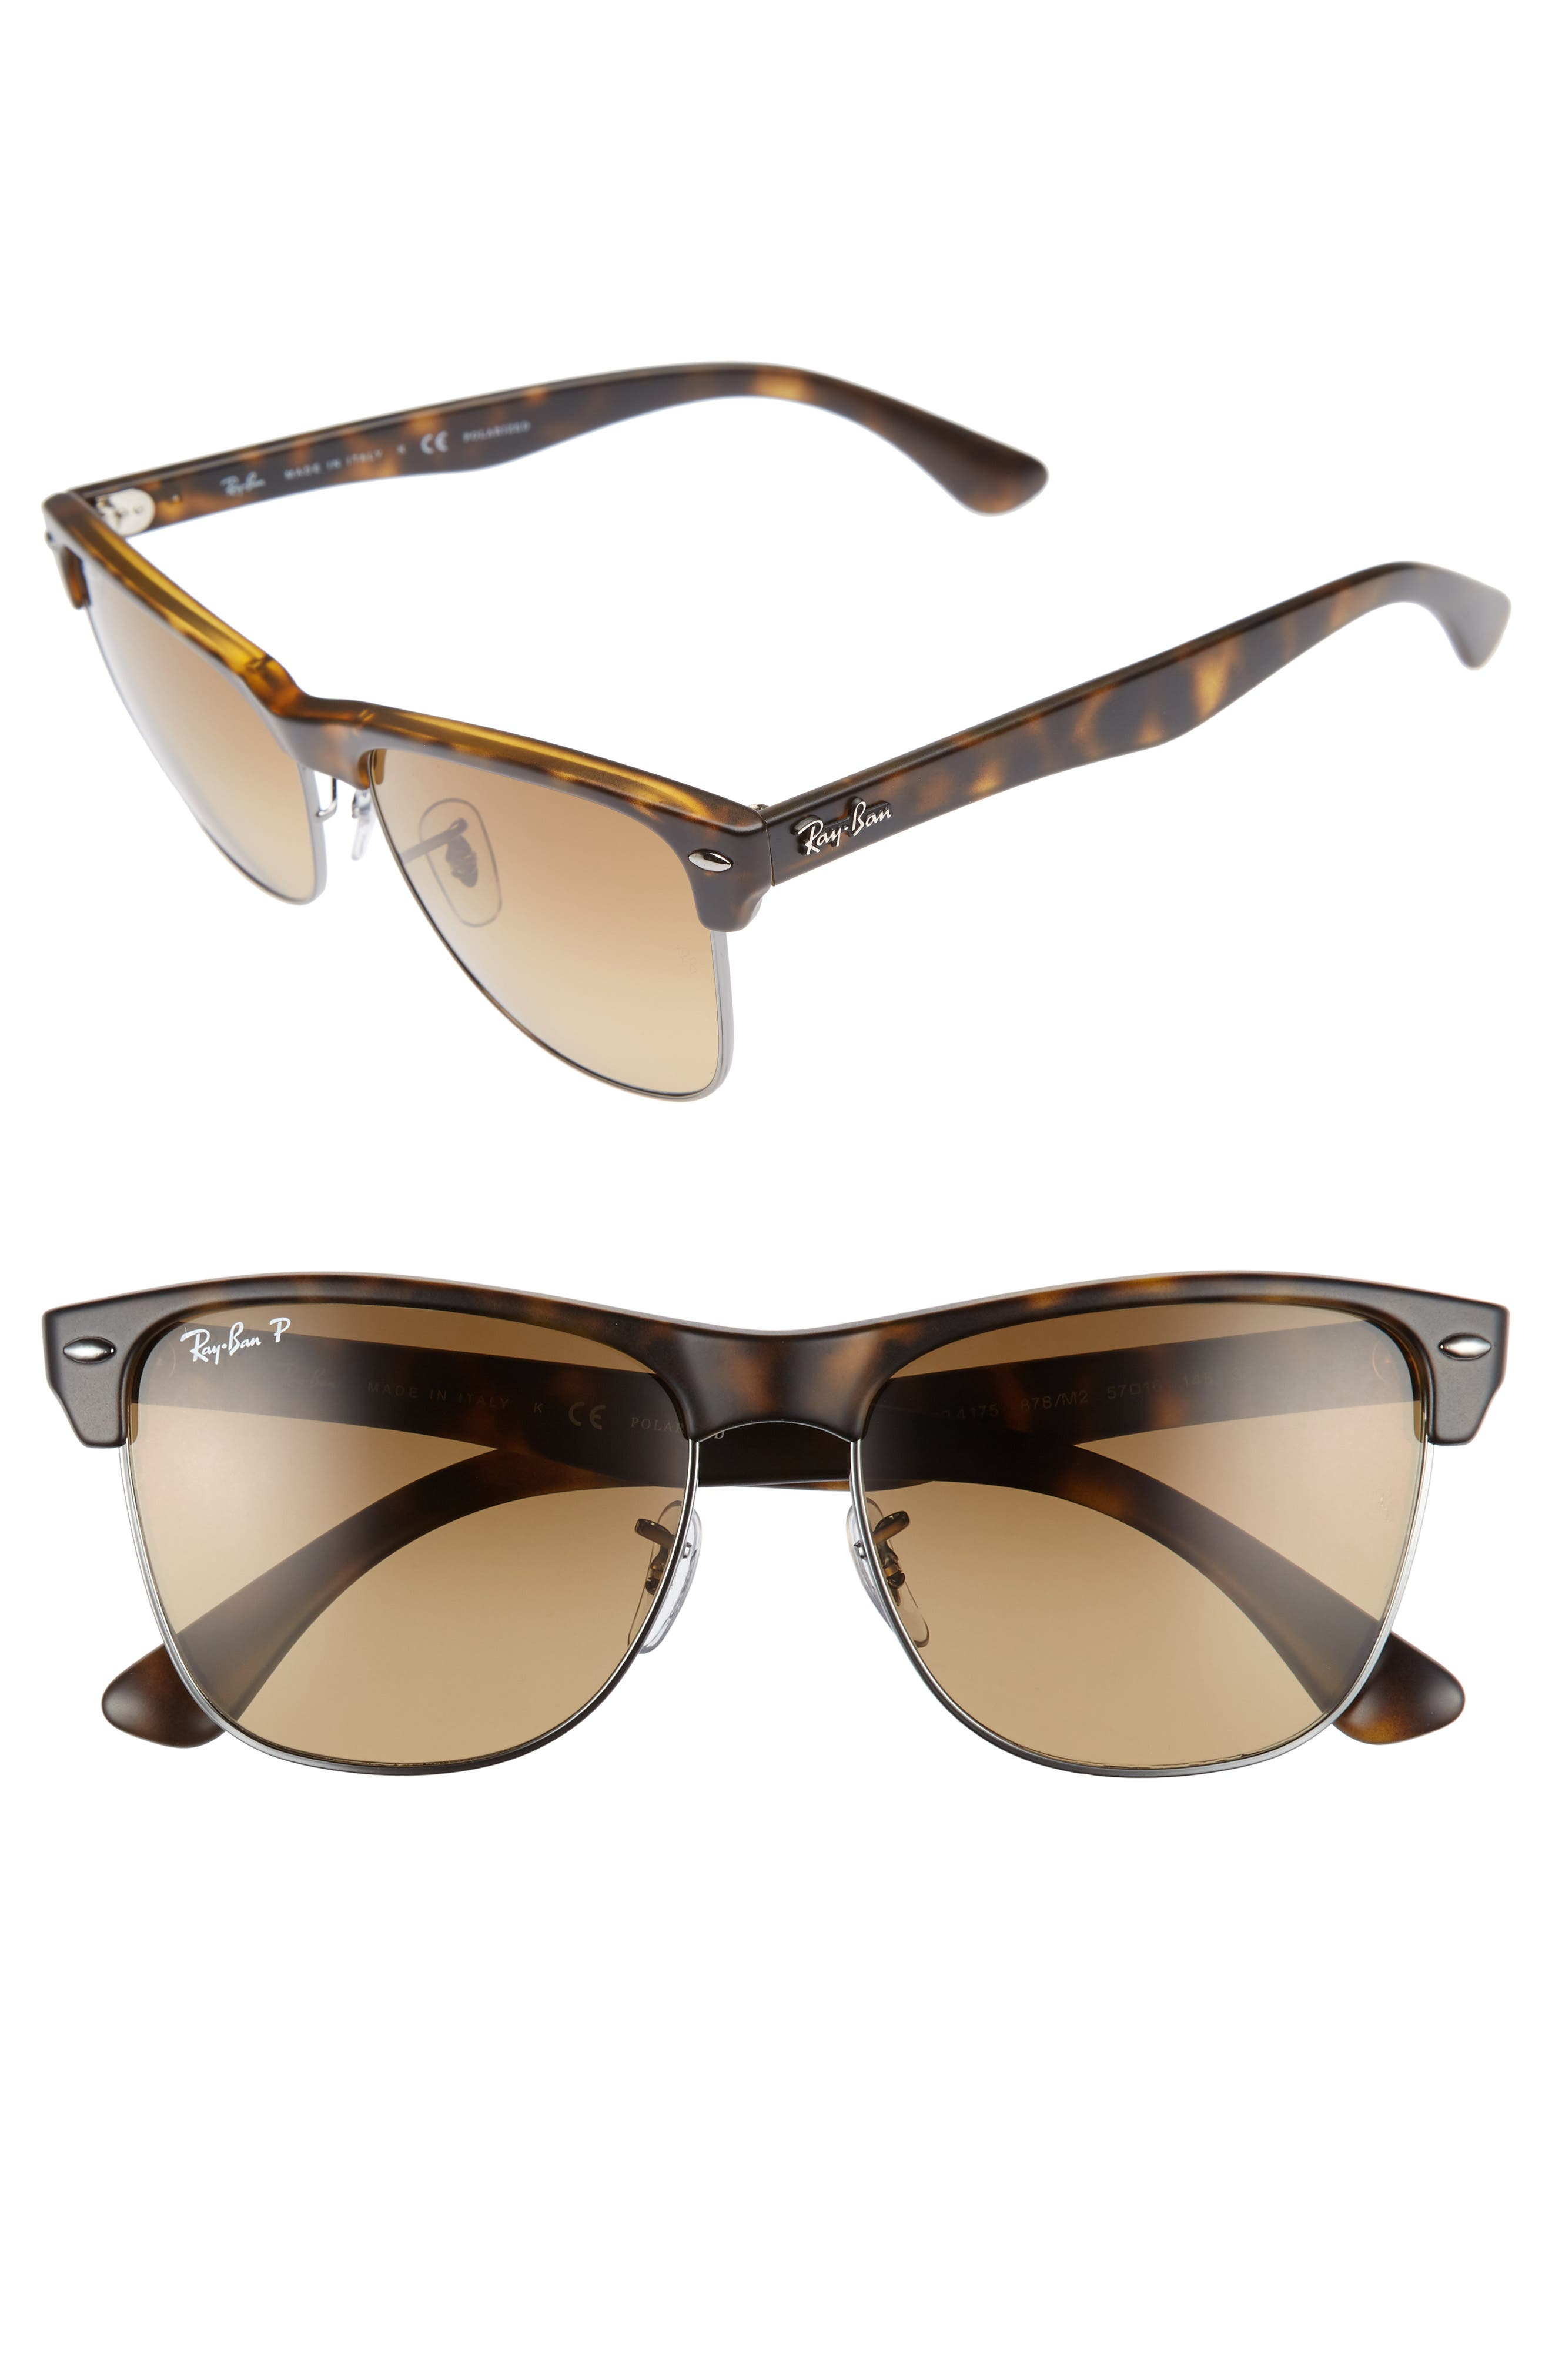 Ray-Ban Clubmaster Flash 57mm Polarized Sunglasses